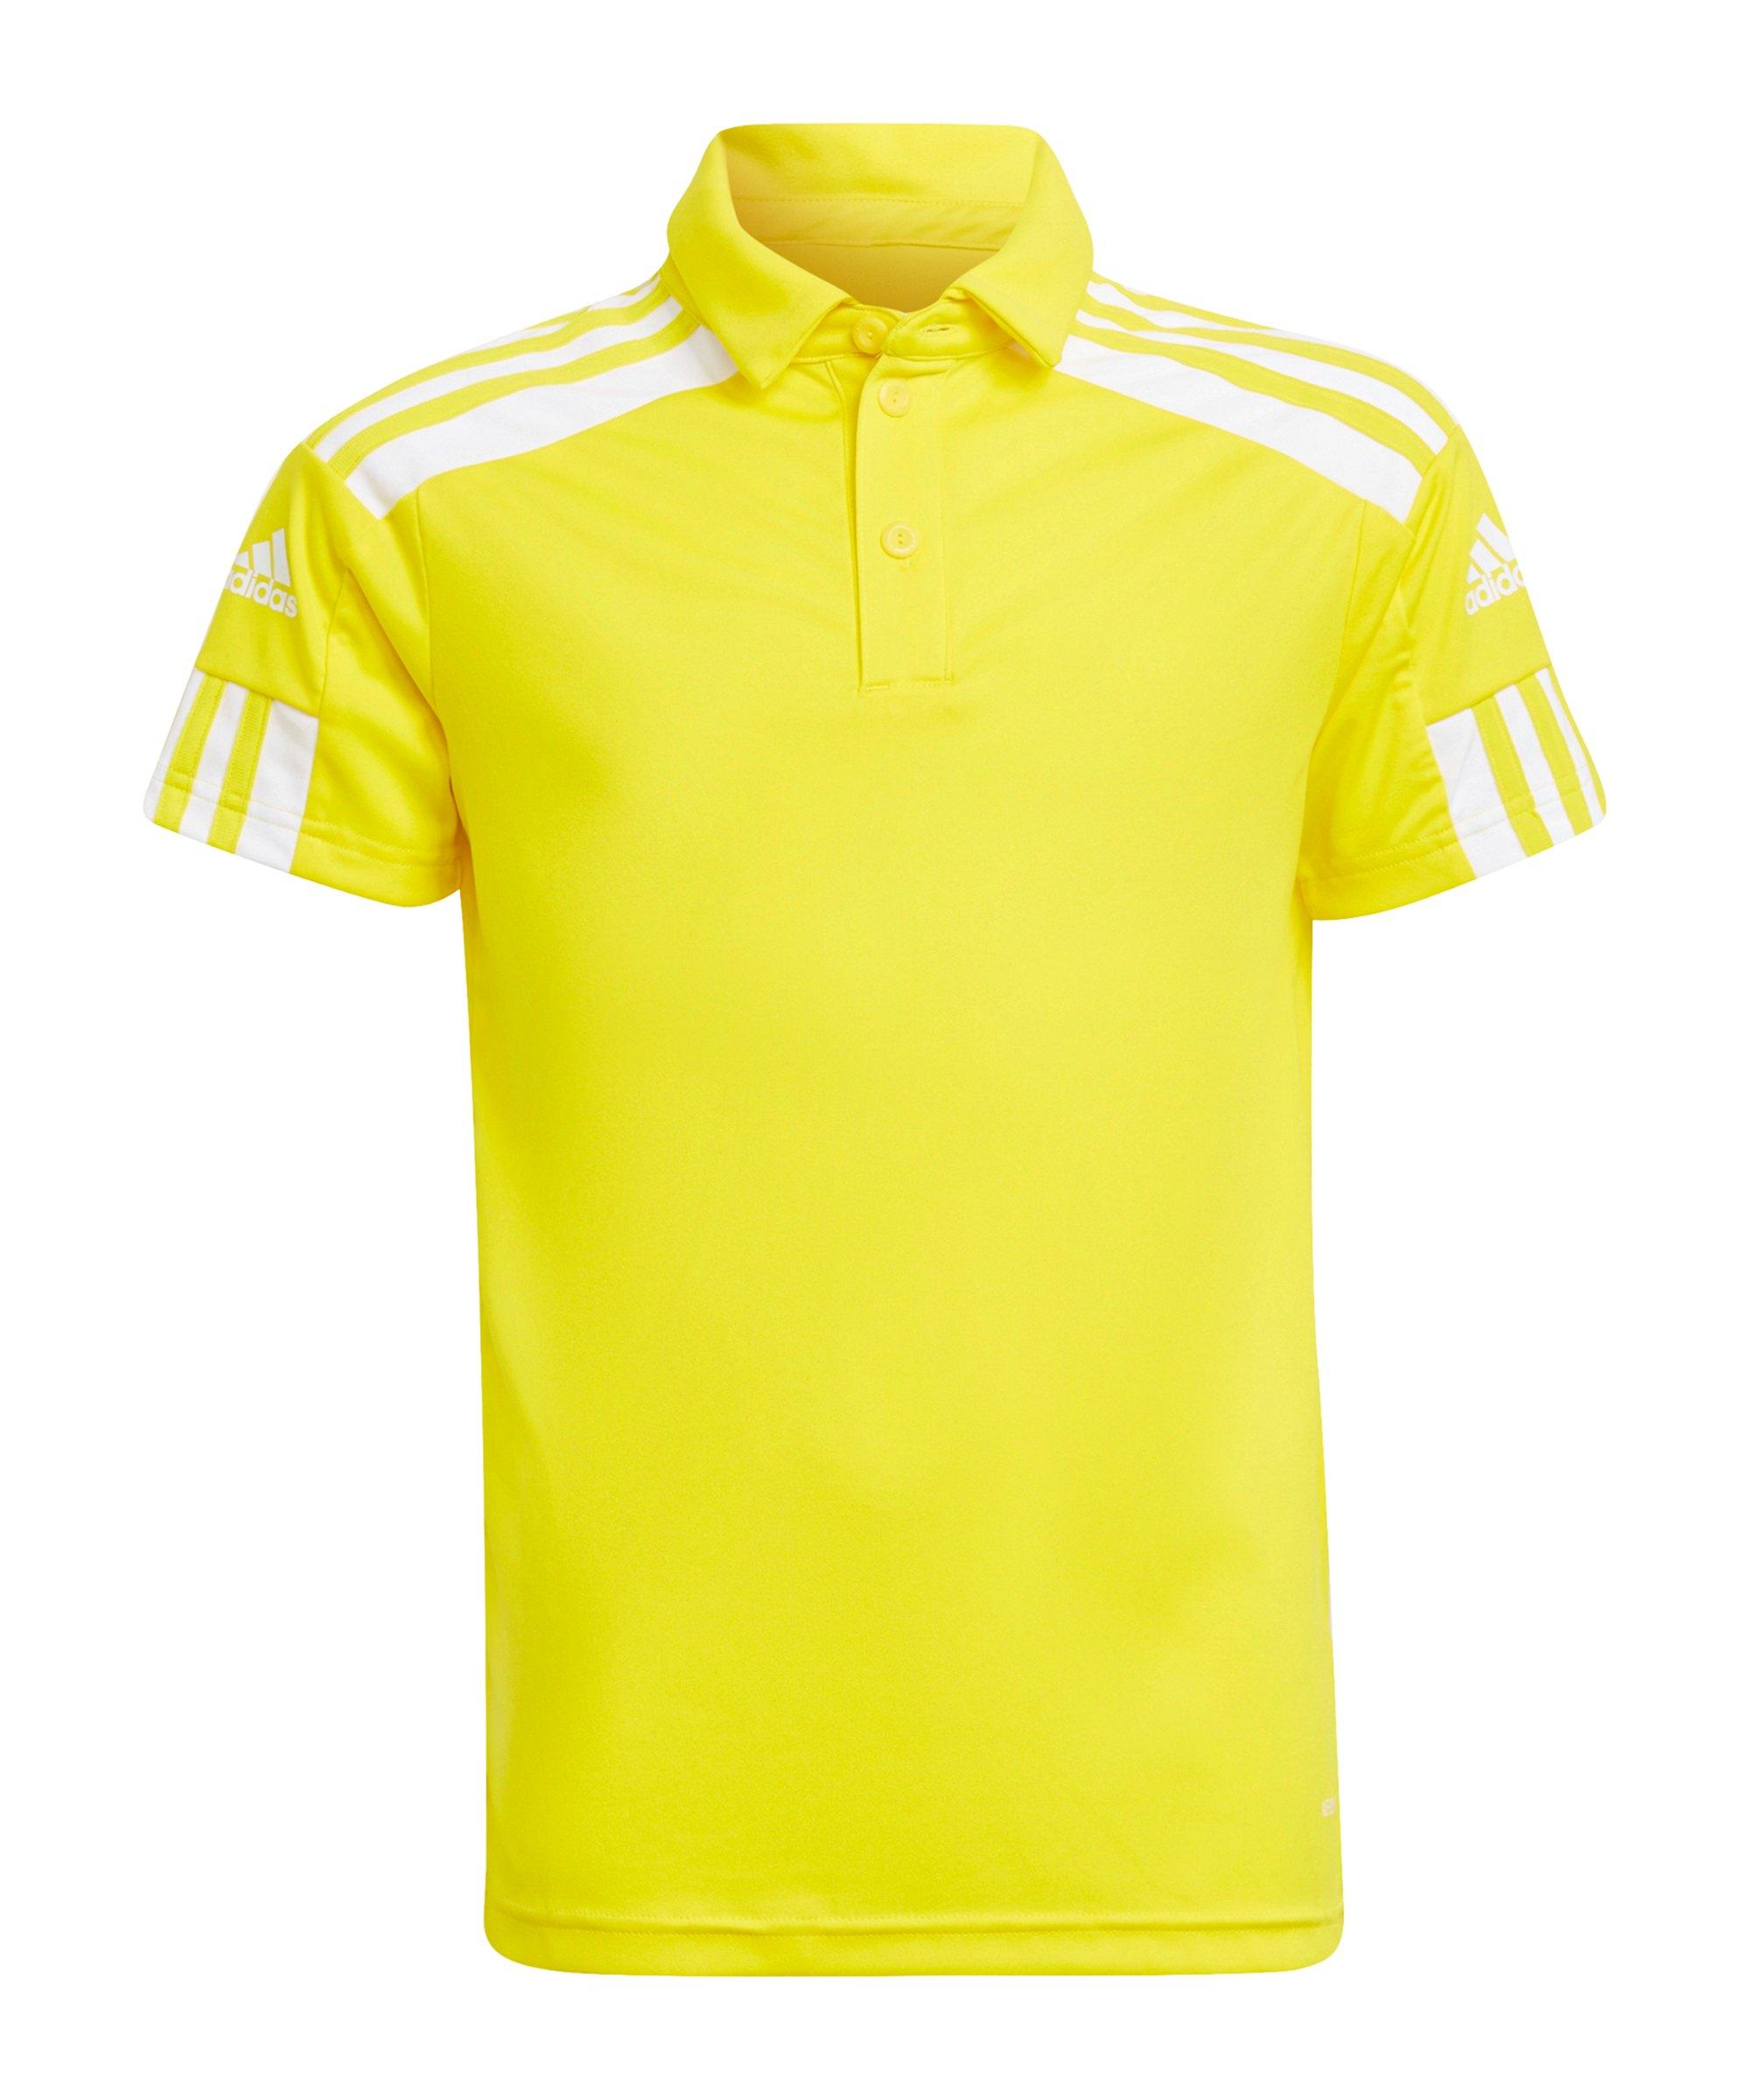 adidas Squadra 21 Poloshirt Kids Gelb Weiss - gelb